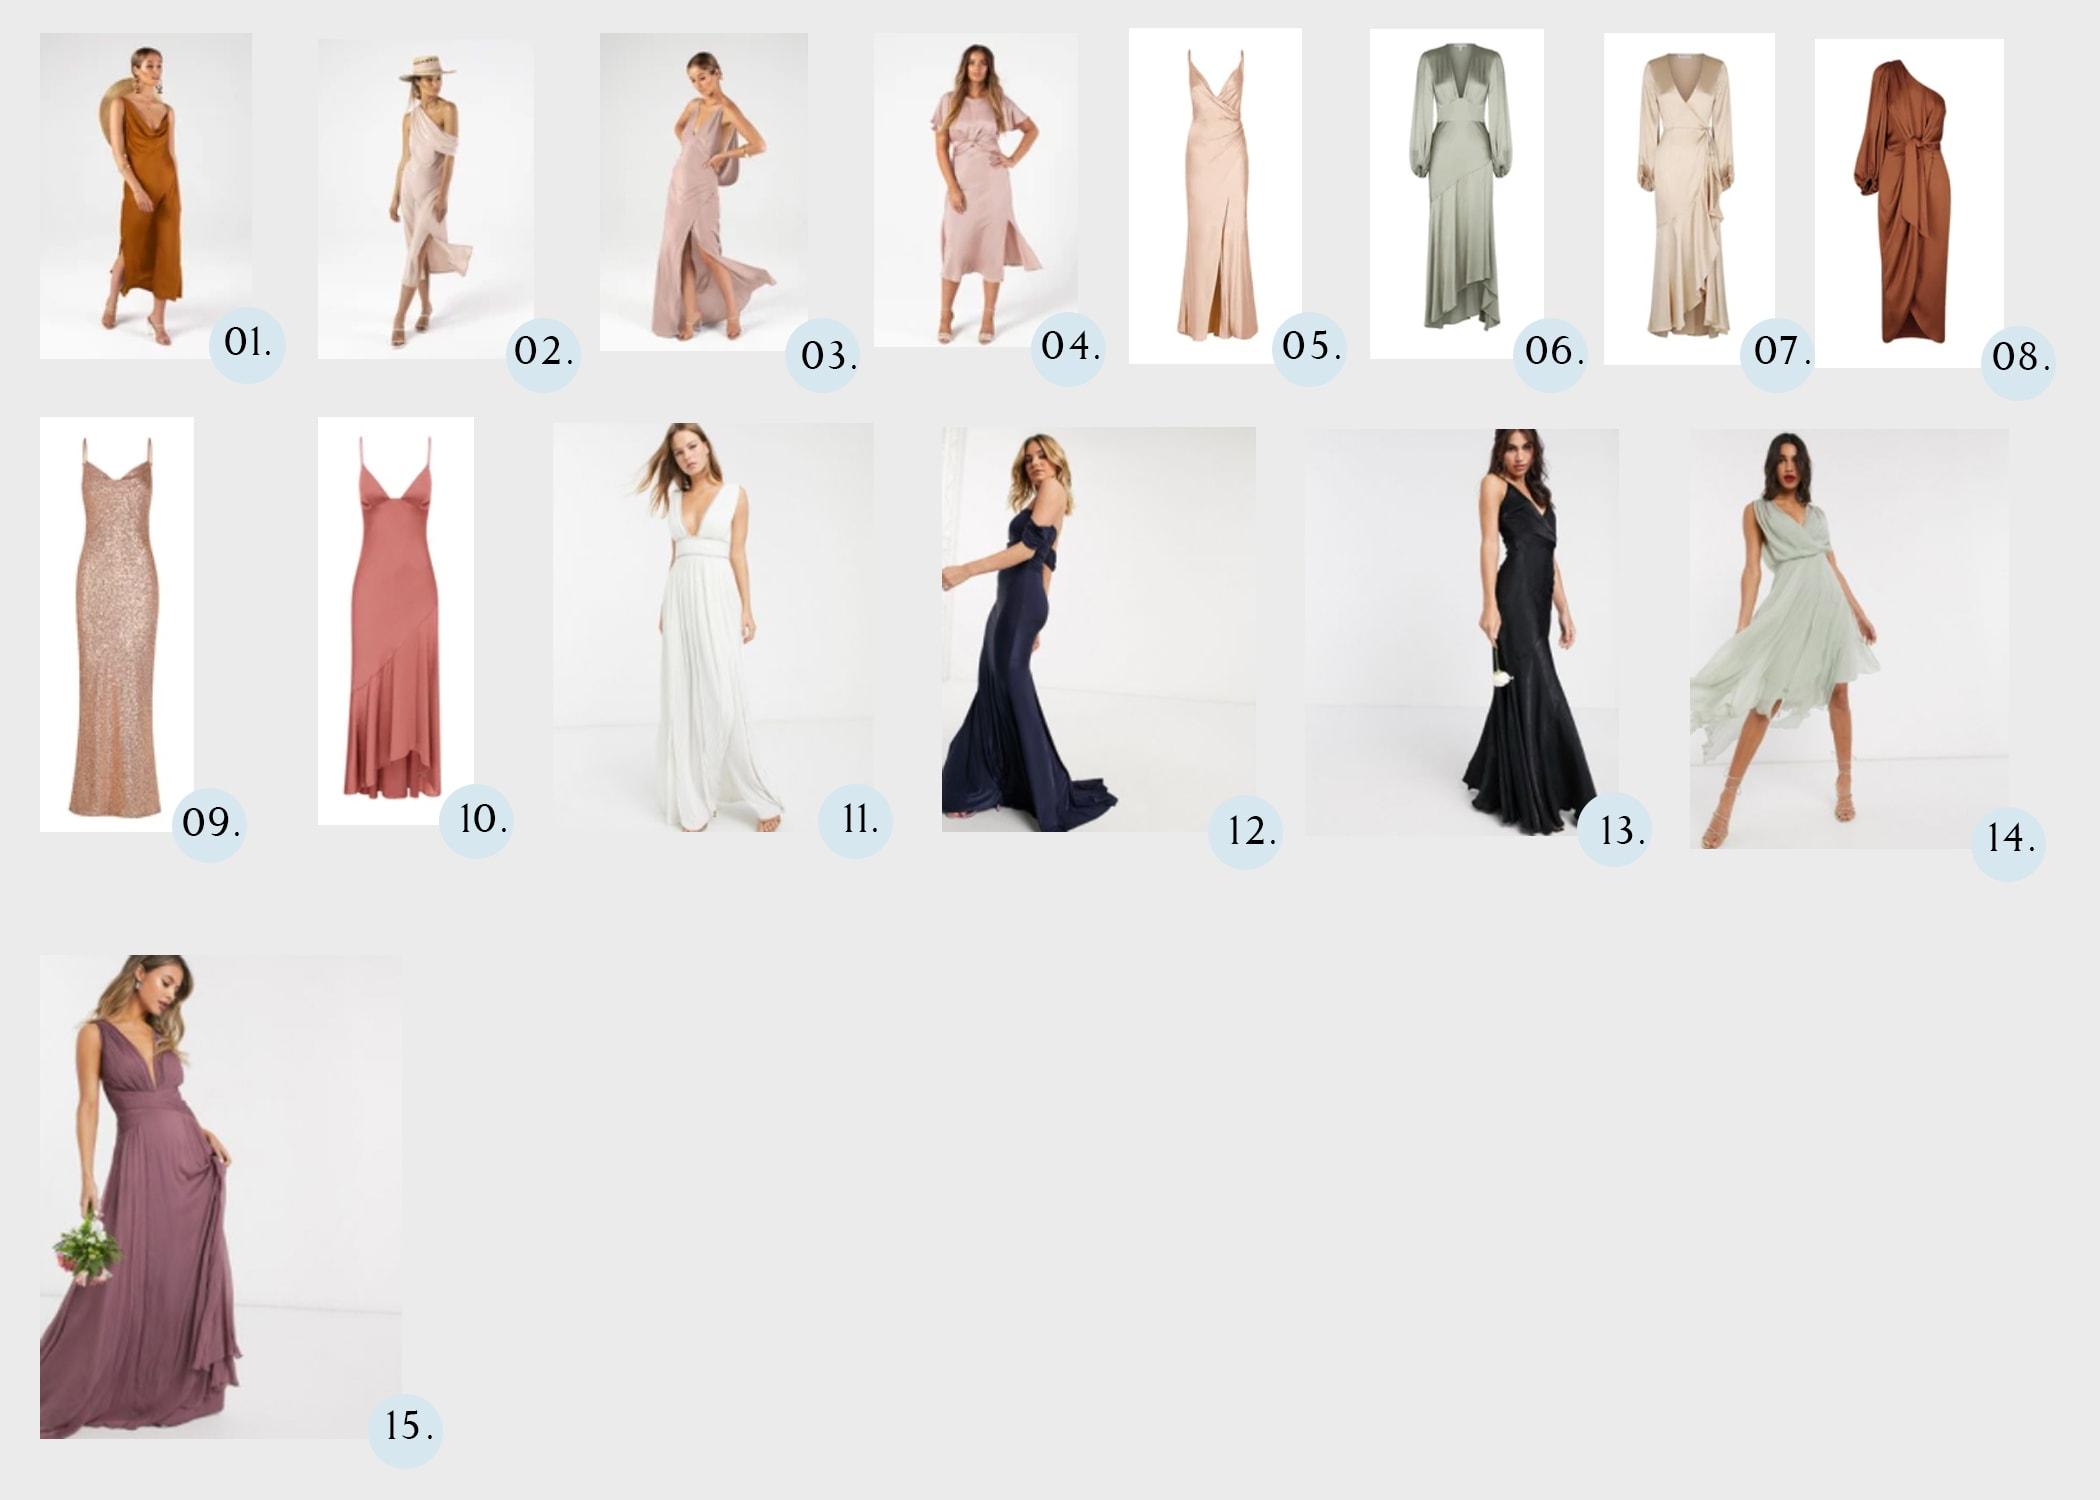 various bridesmaids dresses for 2021